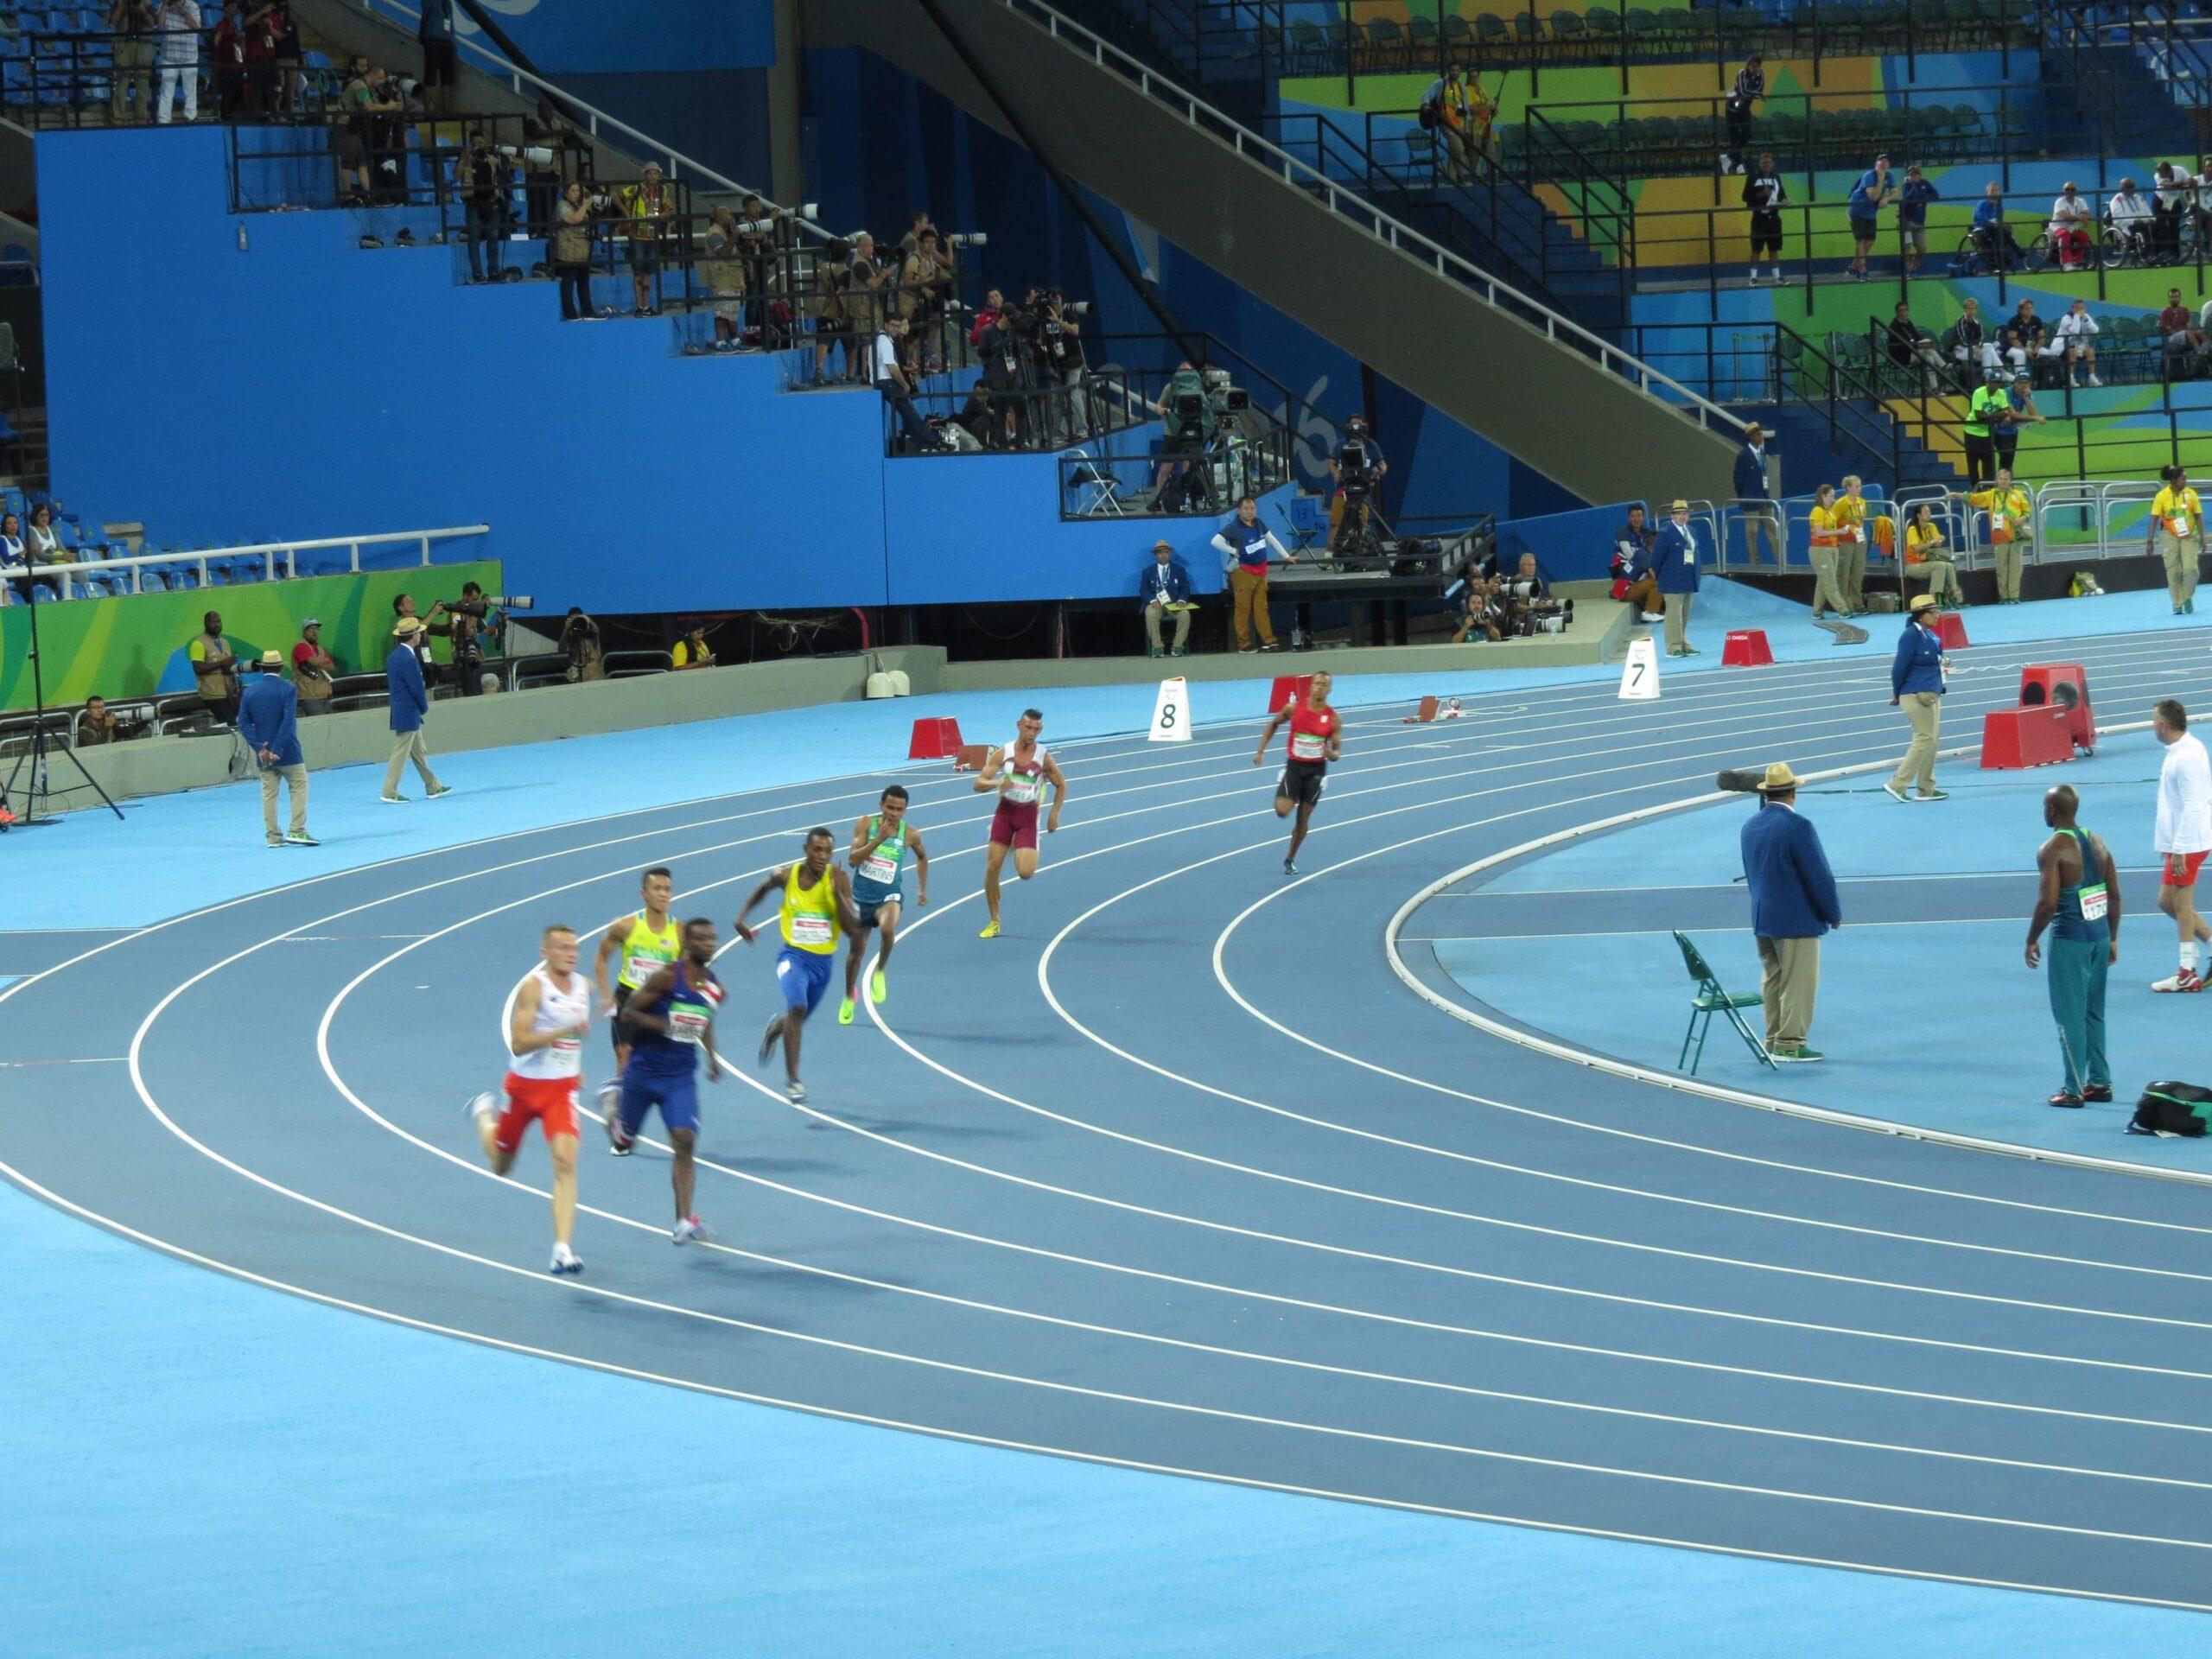 World Athletics Championships Oregon22 And World Athletics U20 Championships Nairobi 2021